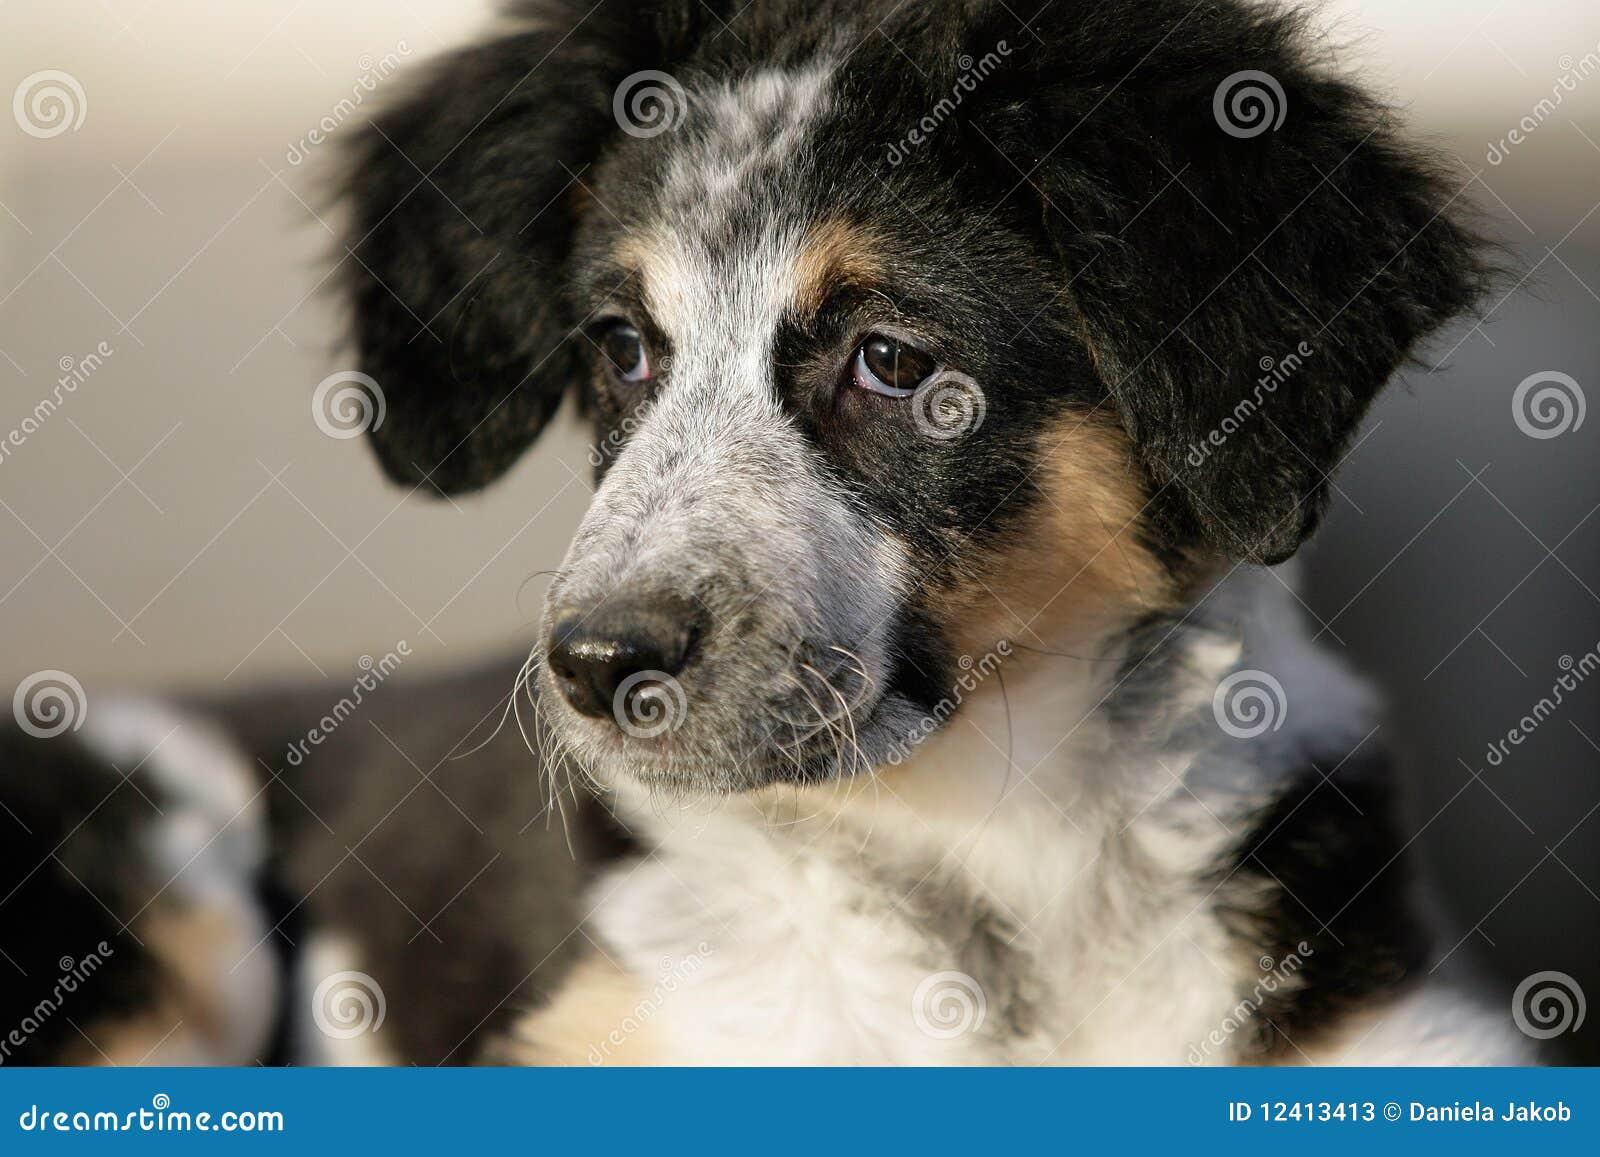 Australian Shepherd Puppy Stock Photos - Image: 12413413